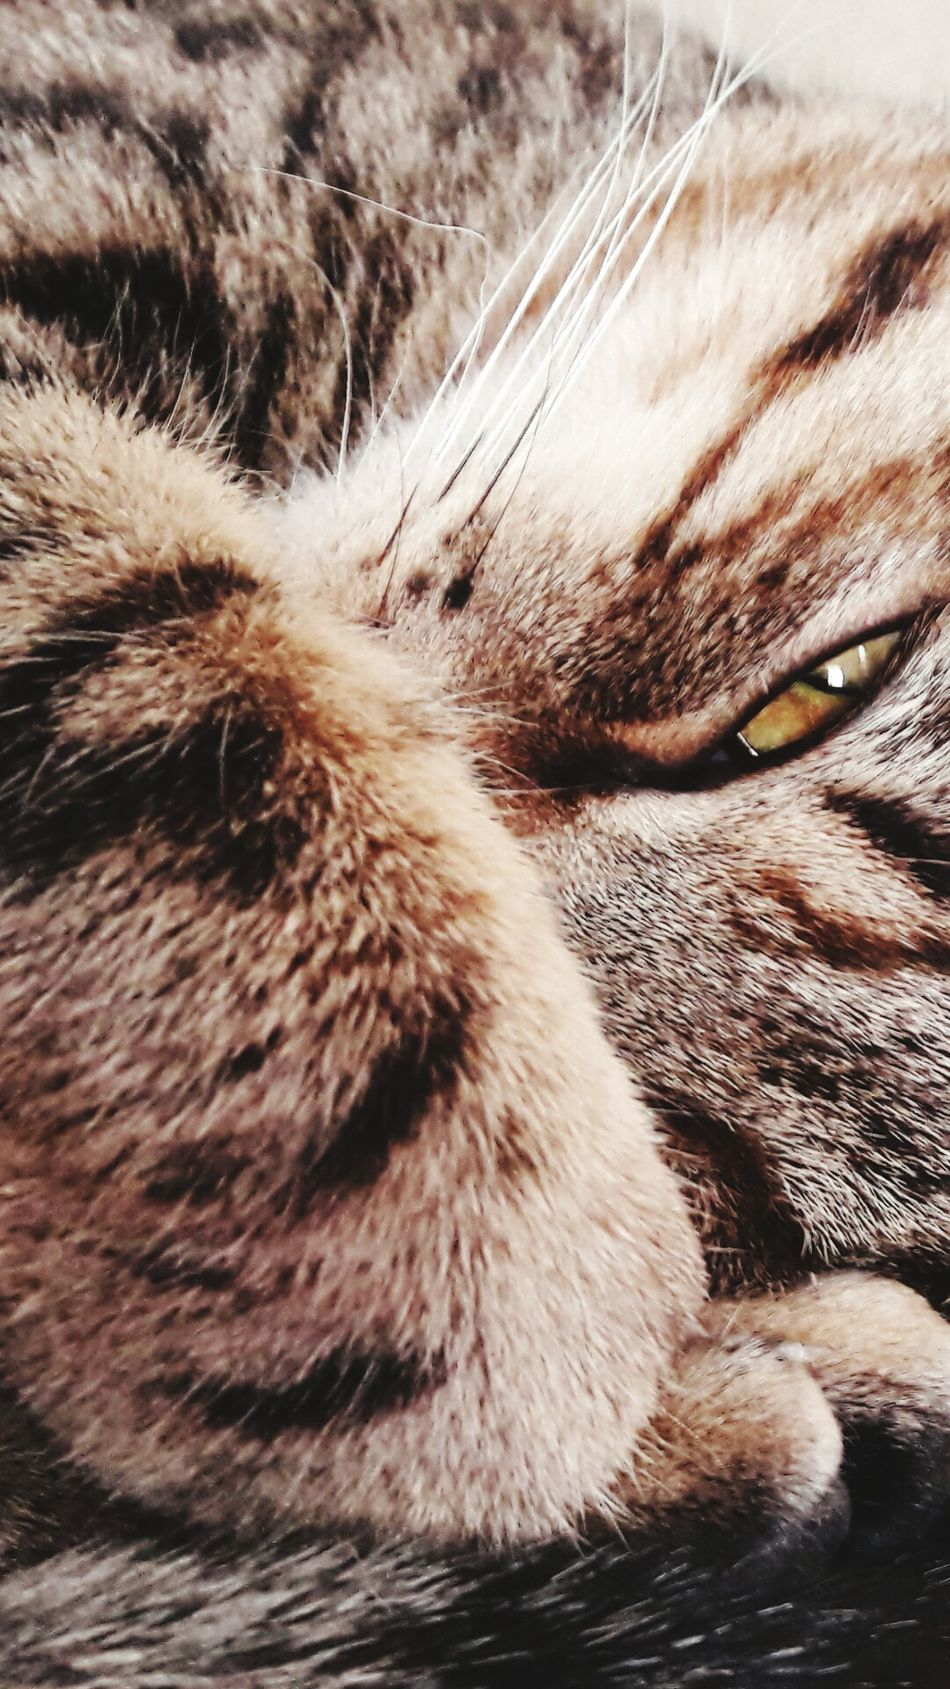 Domestic Cat Domestic Animals Pets Feline Close-up Cat Wallpaper Screensaver Screen Lock Onscreen Animals Lovecats Lovecats❤️ Animal Themes Theme Cute♡ Cats Close Up Closeup Fur Furry Furry Friends Furryfriend Layout